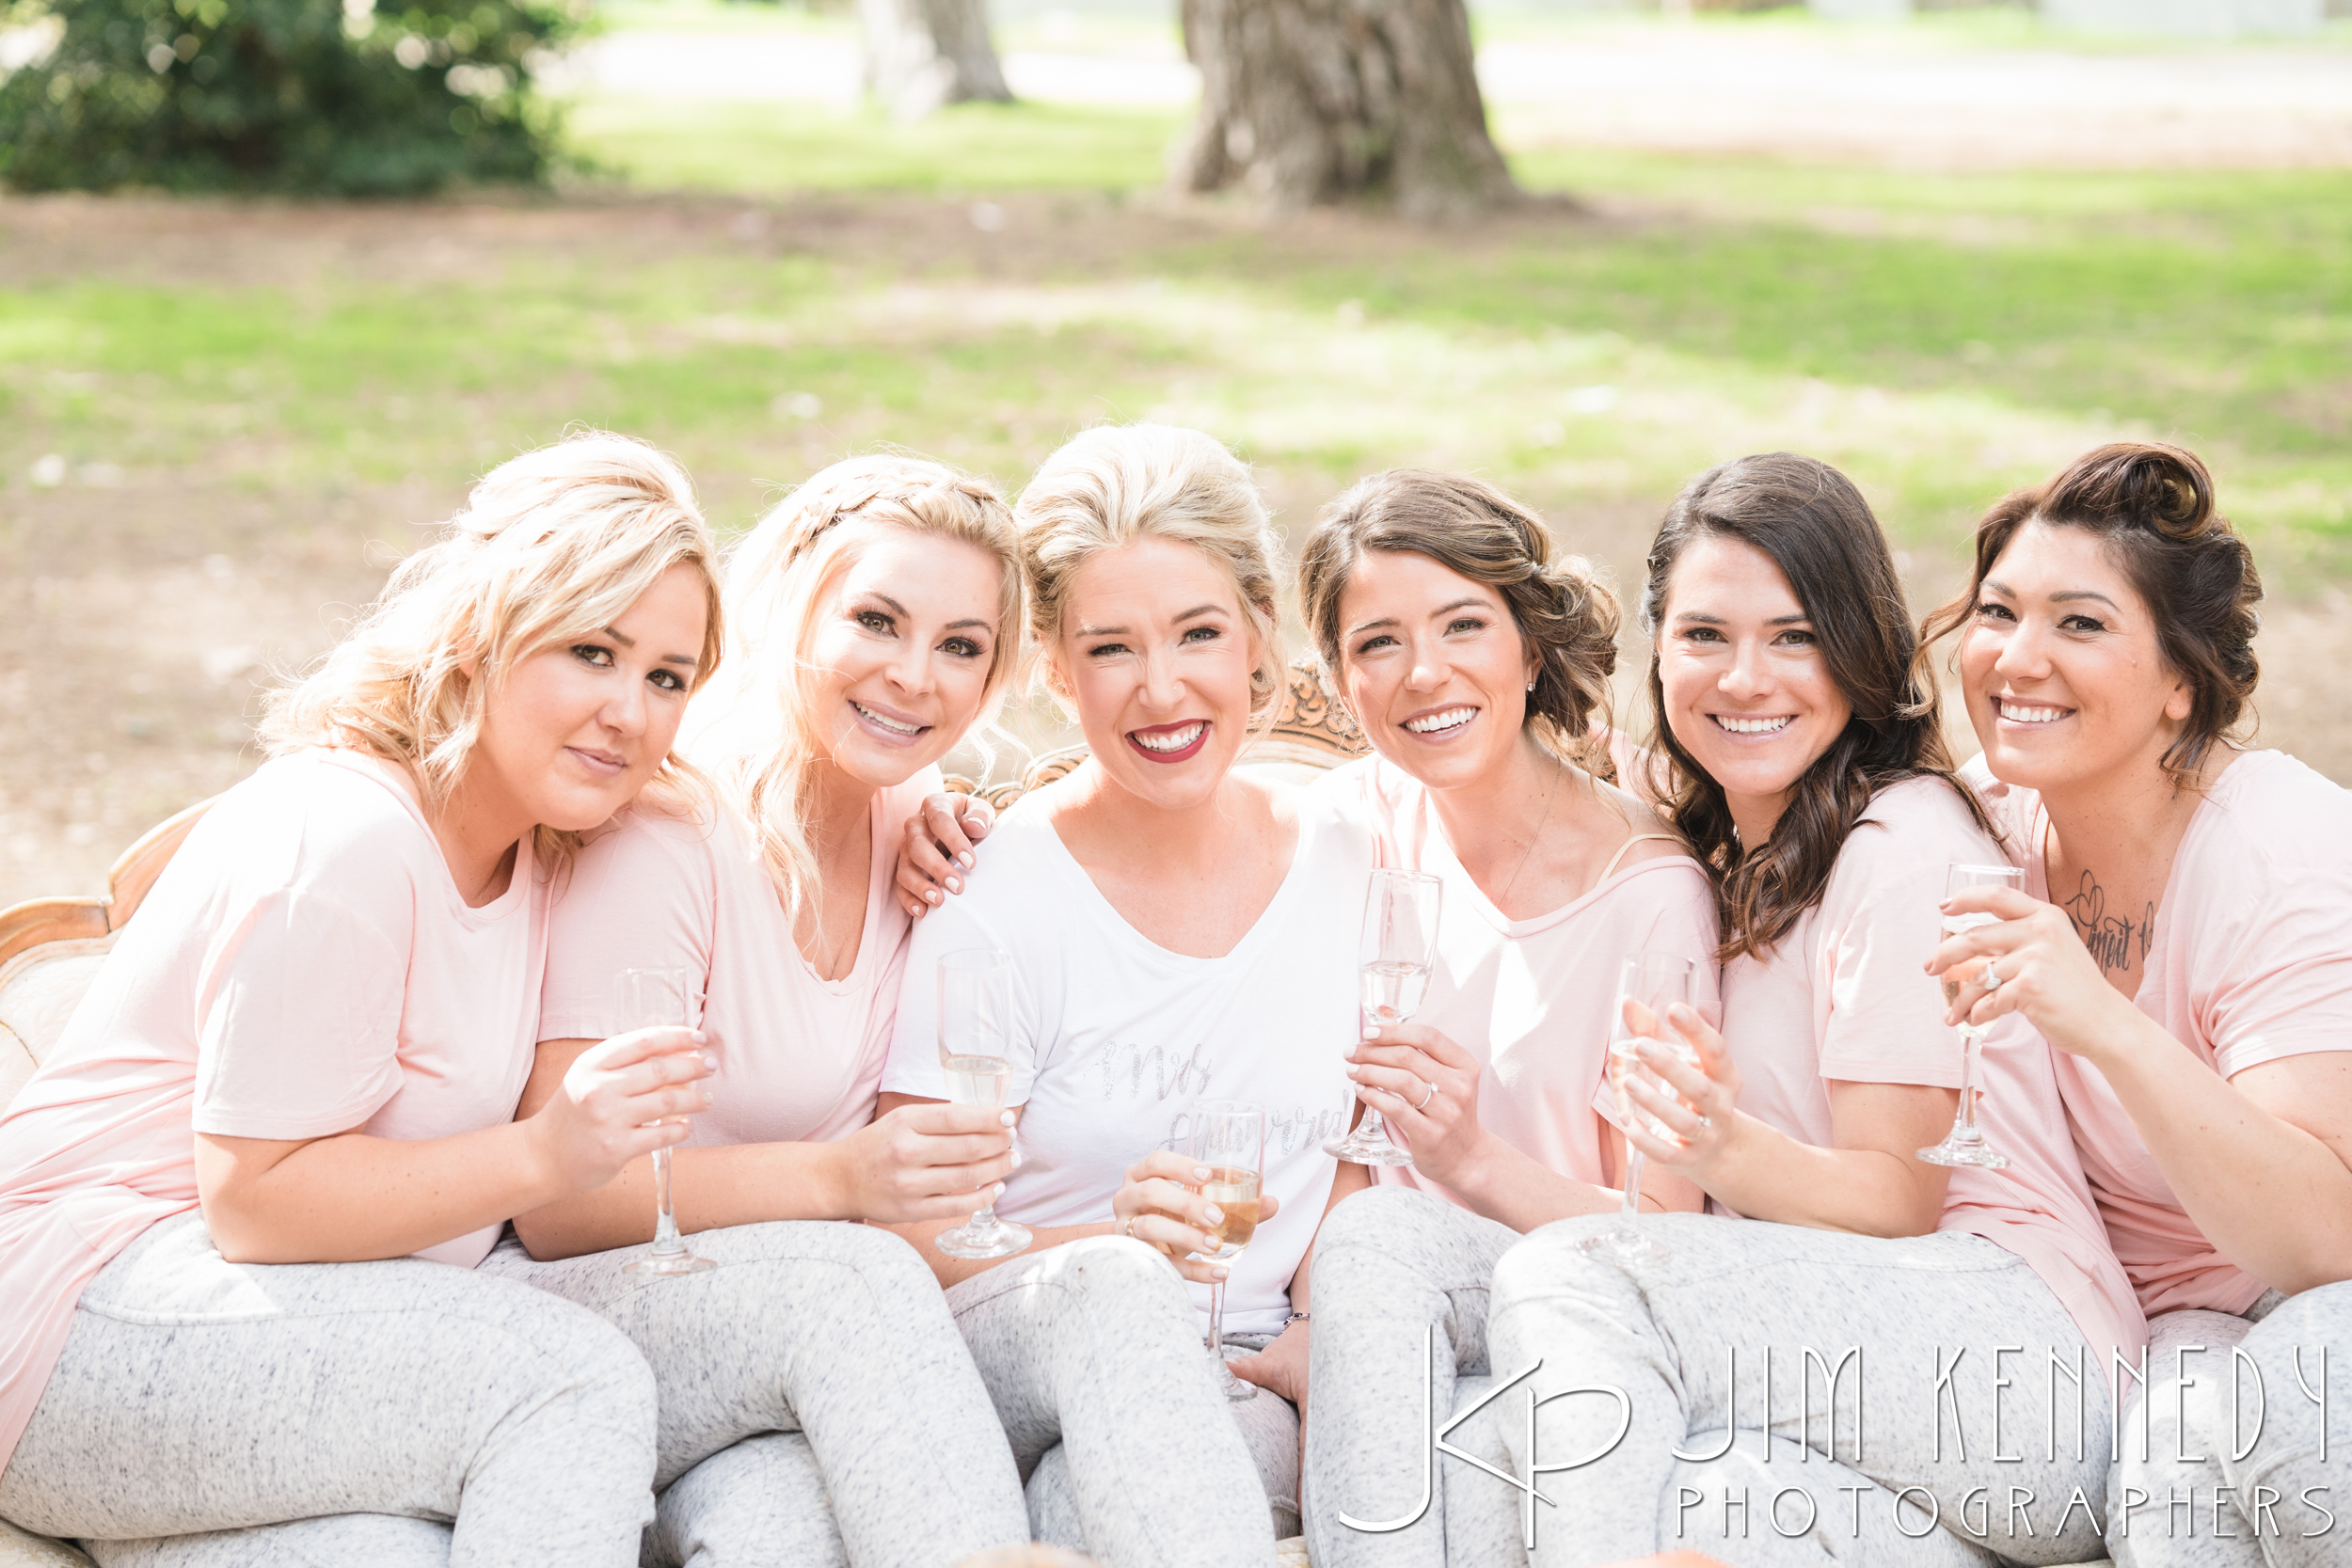 jim_kennedy_photographers_highland_springs_wedding_caitlyn_0040.jpg